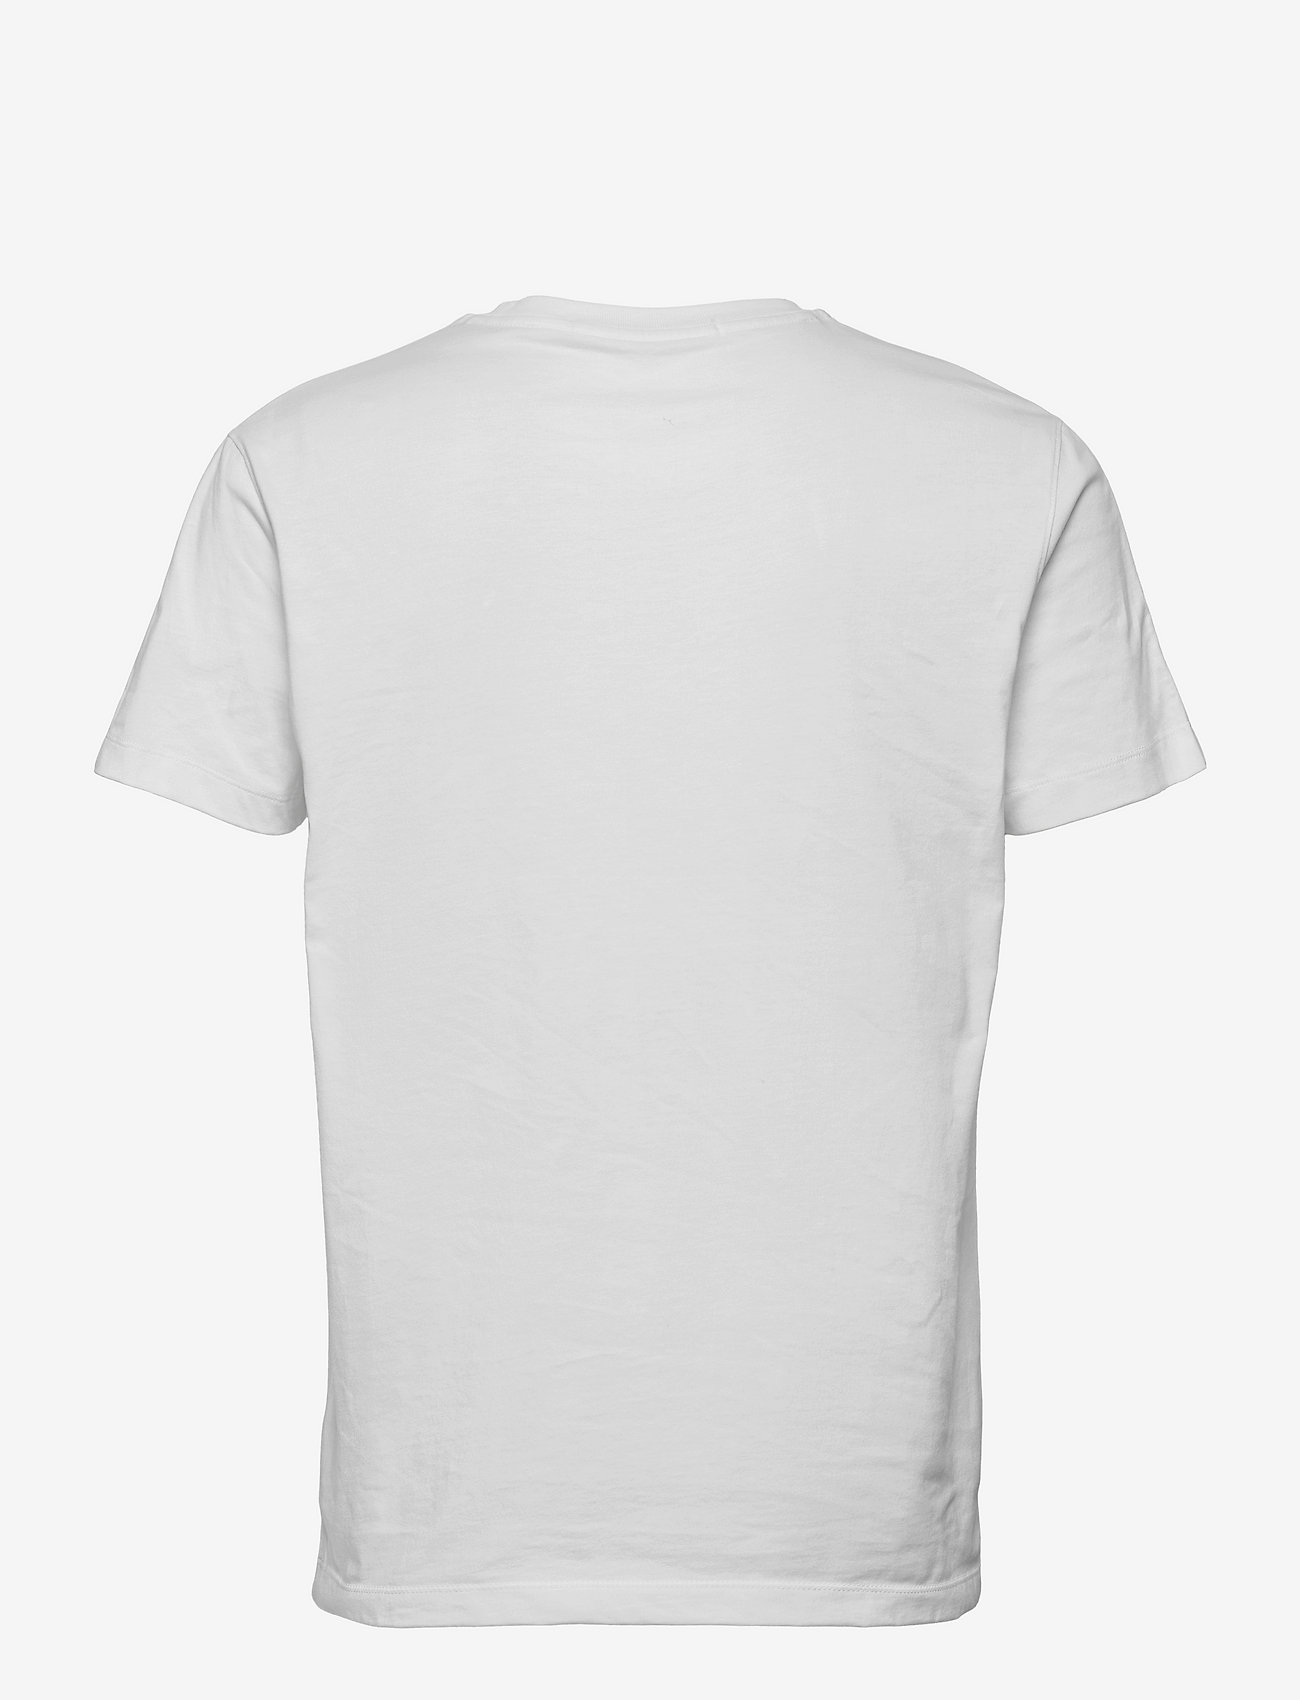 Calvin Klein Jeans - LOGO JACQUARD SHOULDER TEE - basic t-shirts - bright white - 1